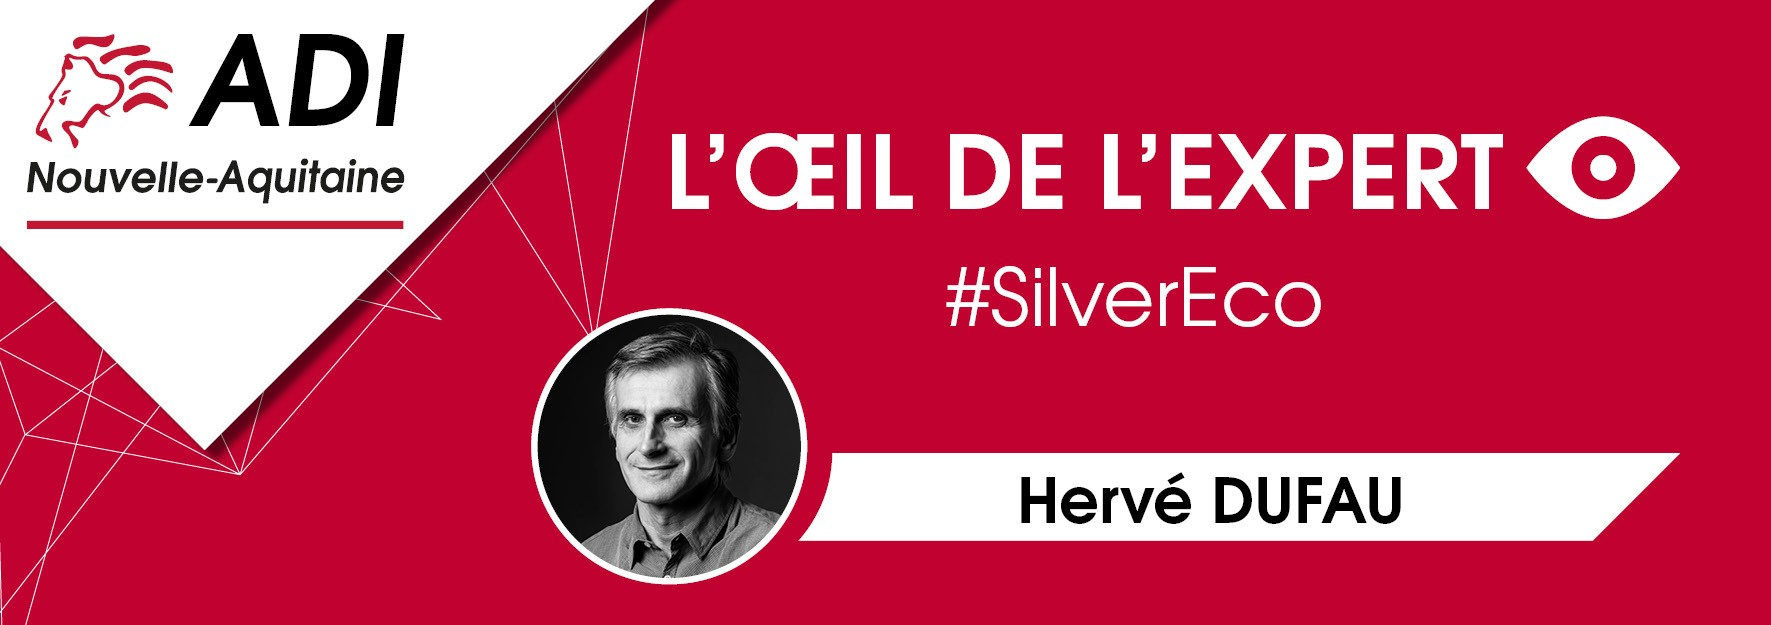 L'œil de l'expert #SilverEco : Hervé Dufau